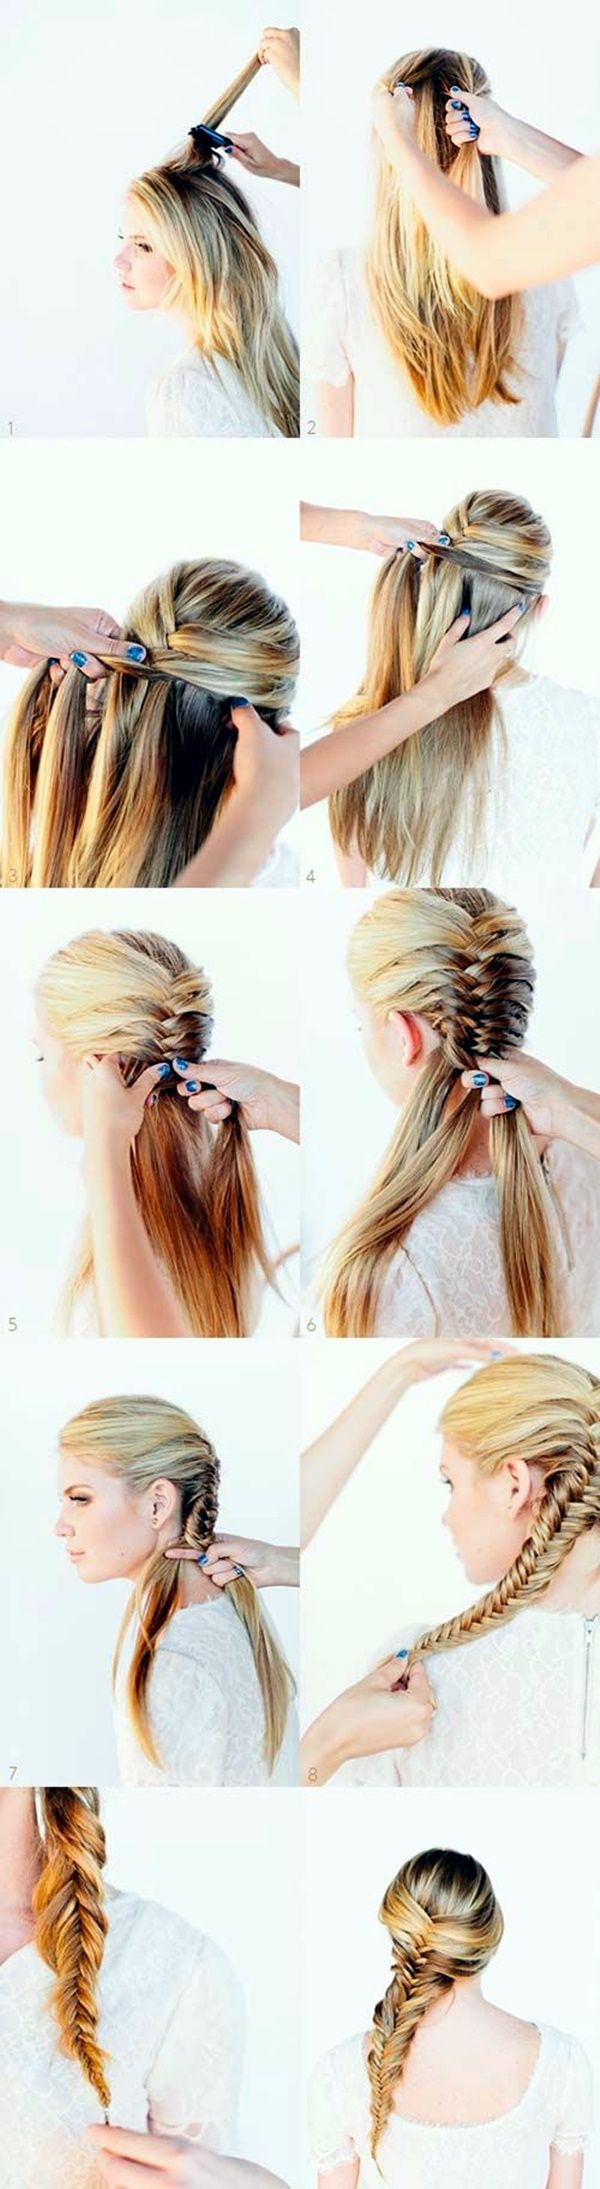 best favorite hair styles images on pinterest make up looks